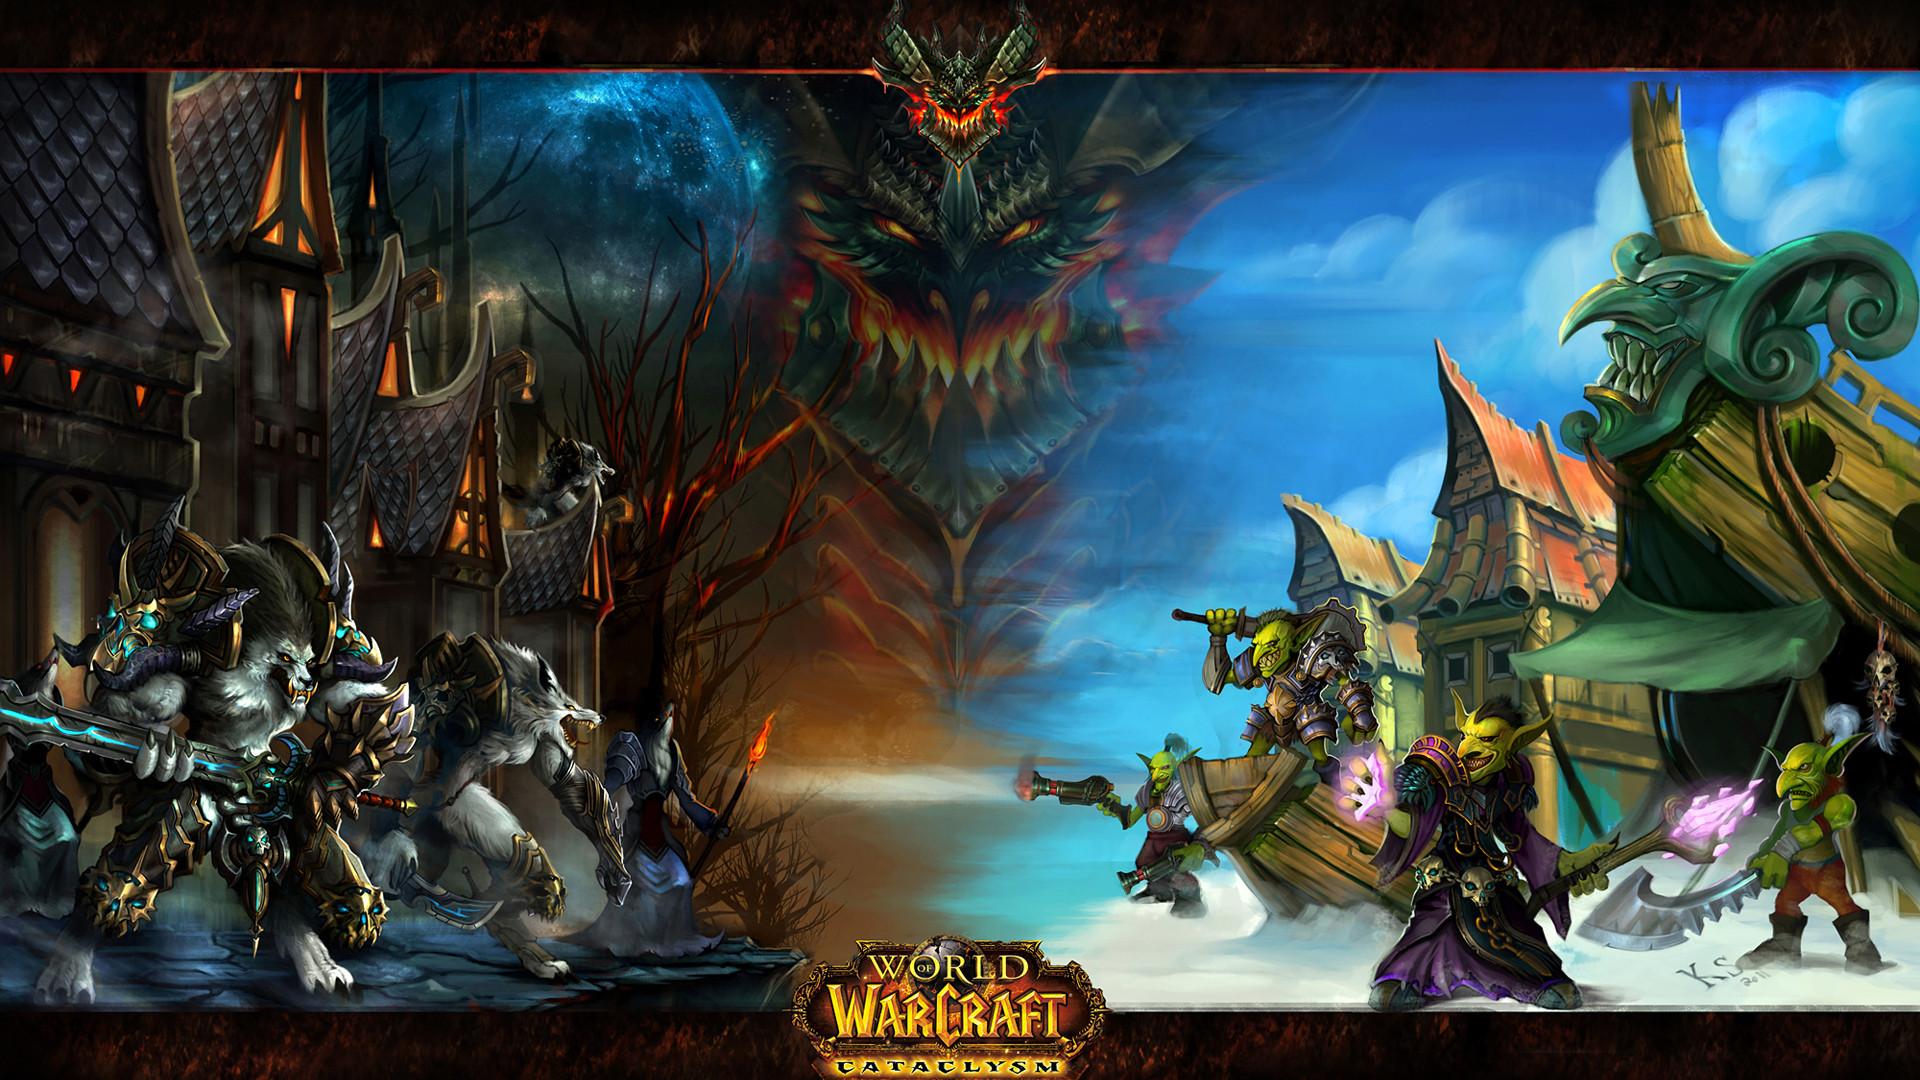 3840x2160 Preview wallpaper world of warcraft, gnome, goblin, rocket, art 3840x2160